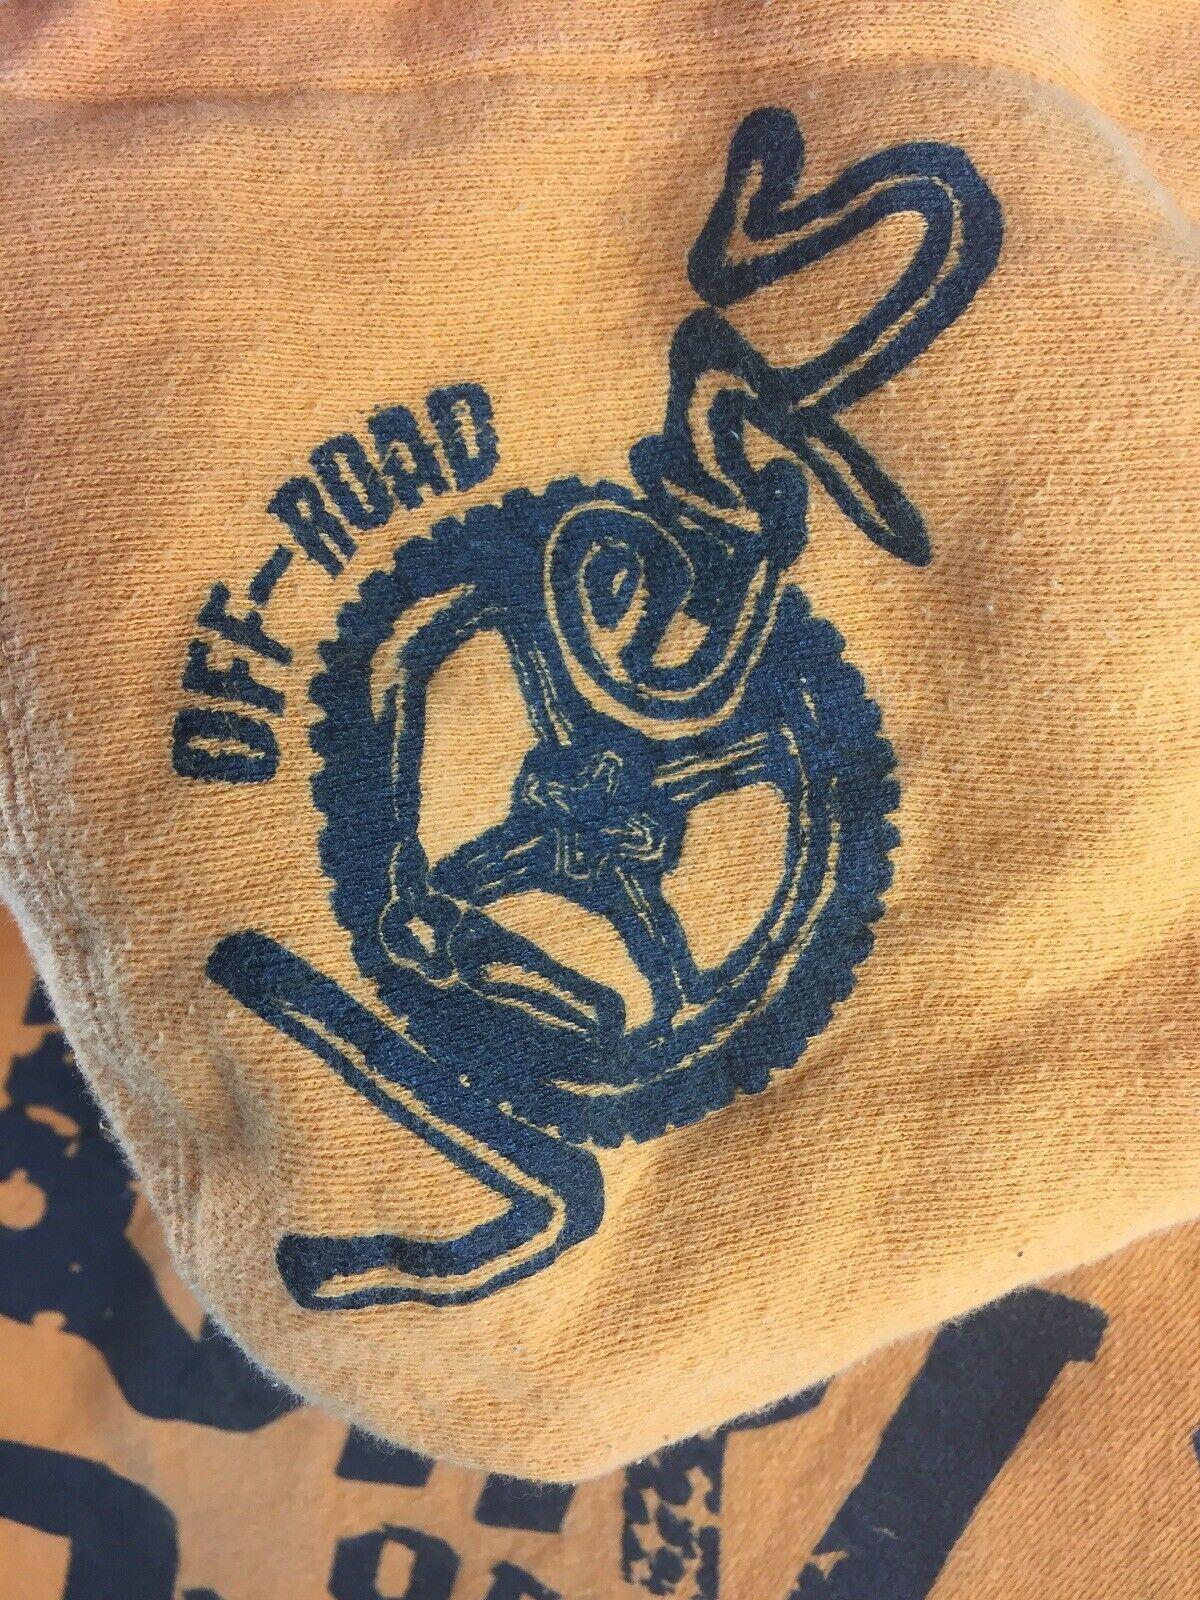 Off-Road Vixens Cotton Poly Orange Hooded Zipper Sweatshirt Size M image 4